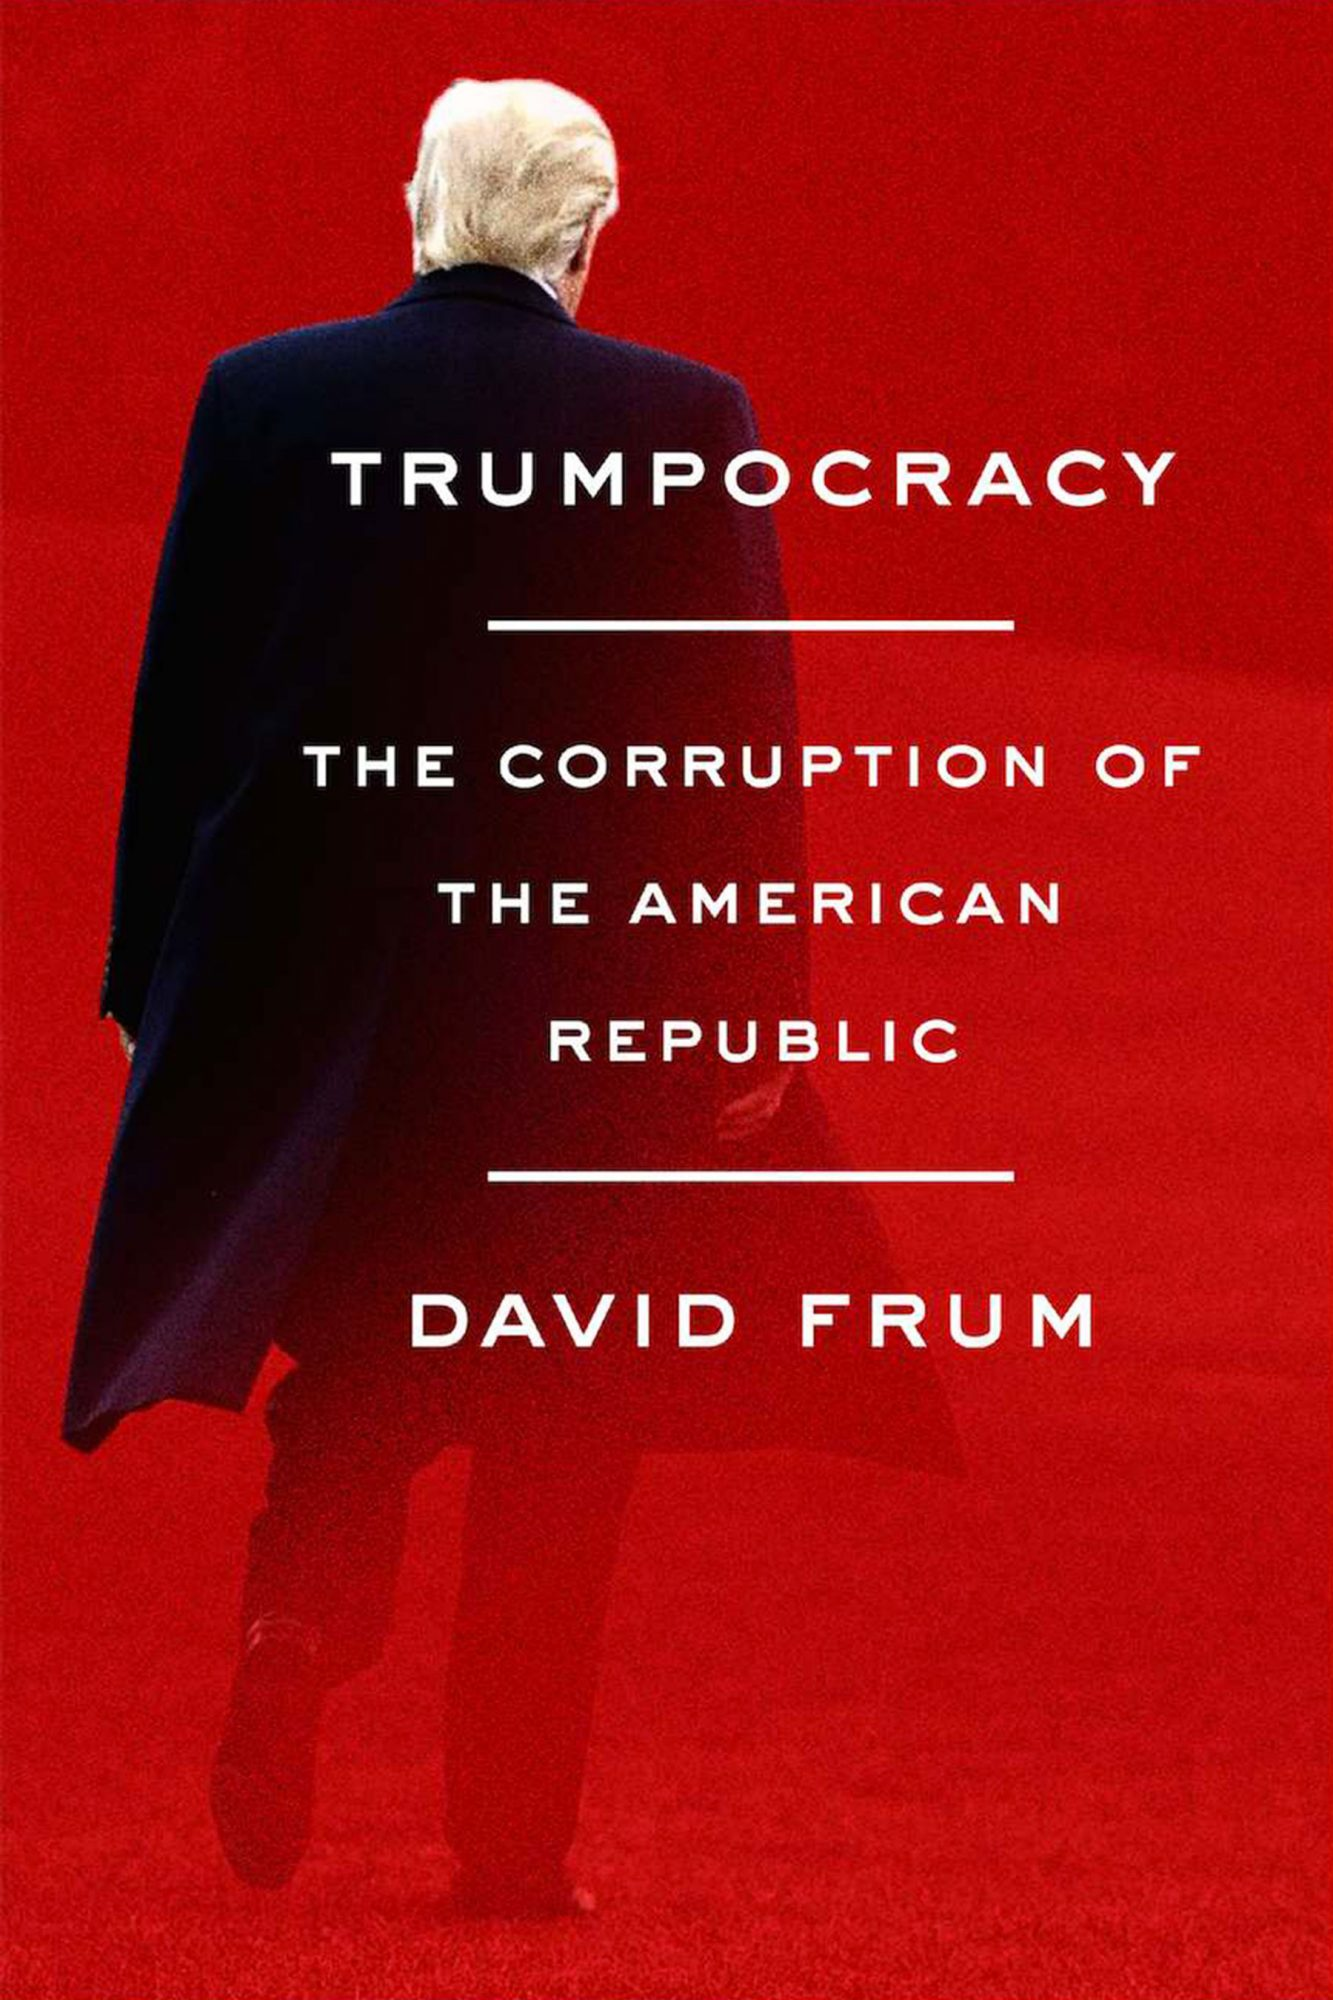 David-Frum-book